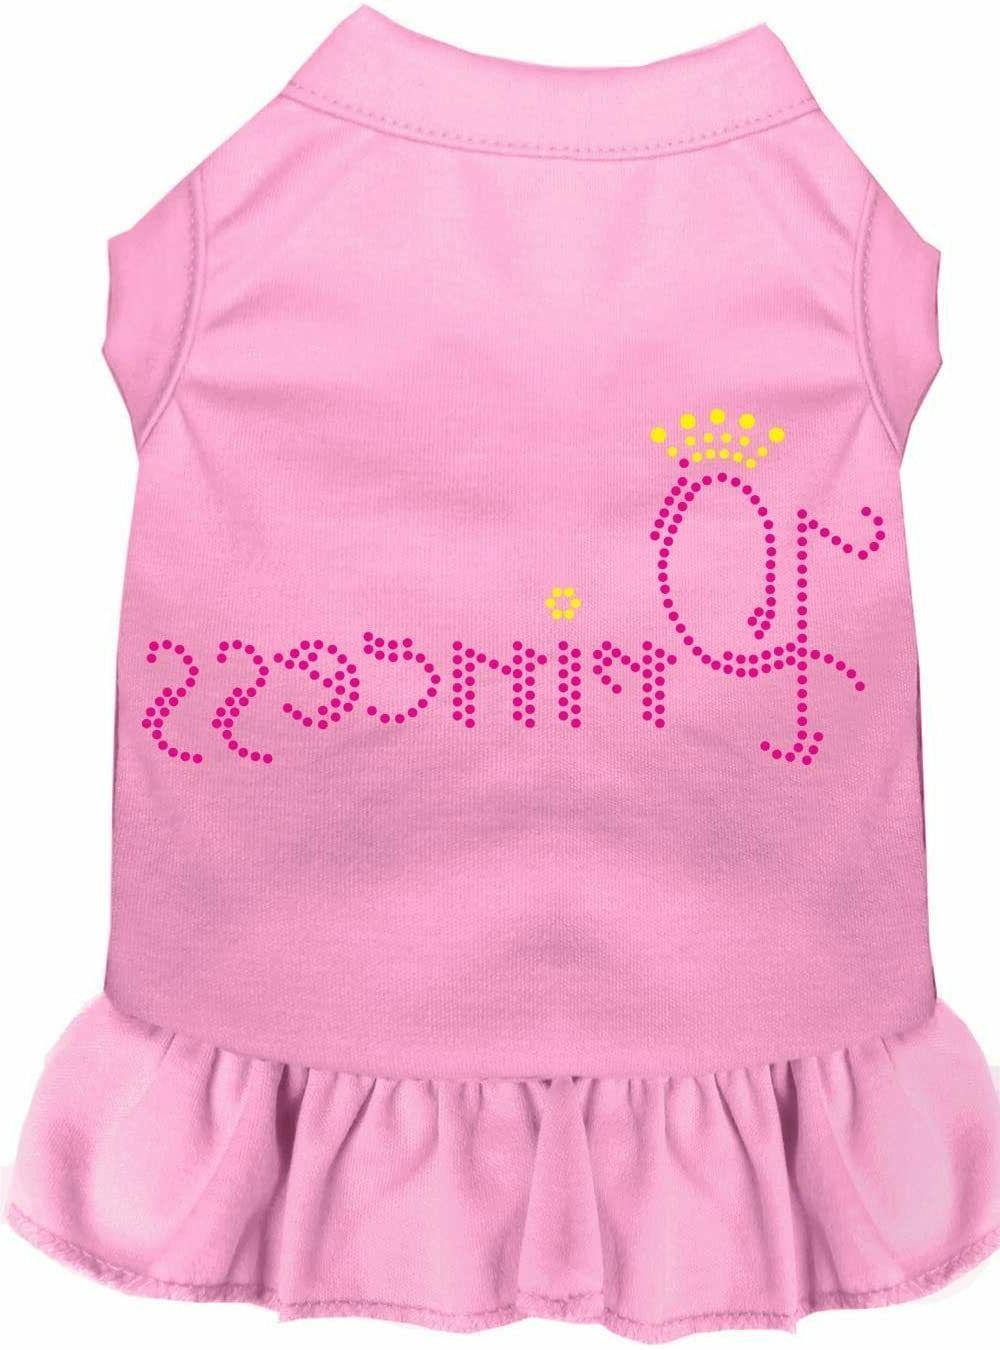 princess rhinestone dress by pet assorted colors